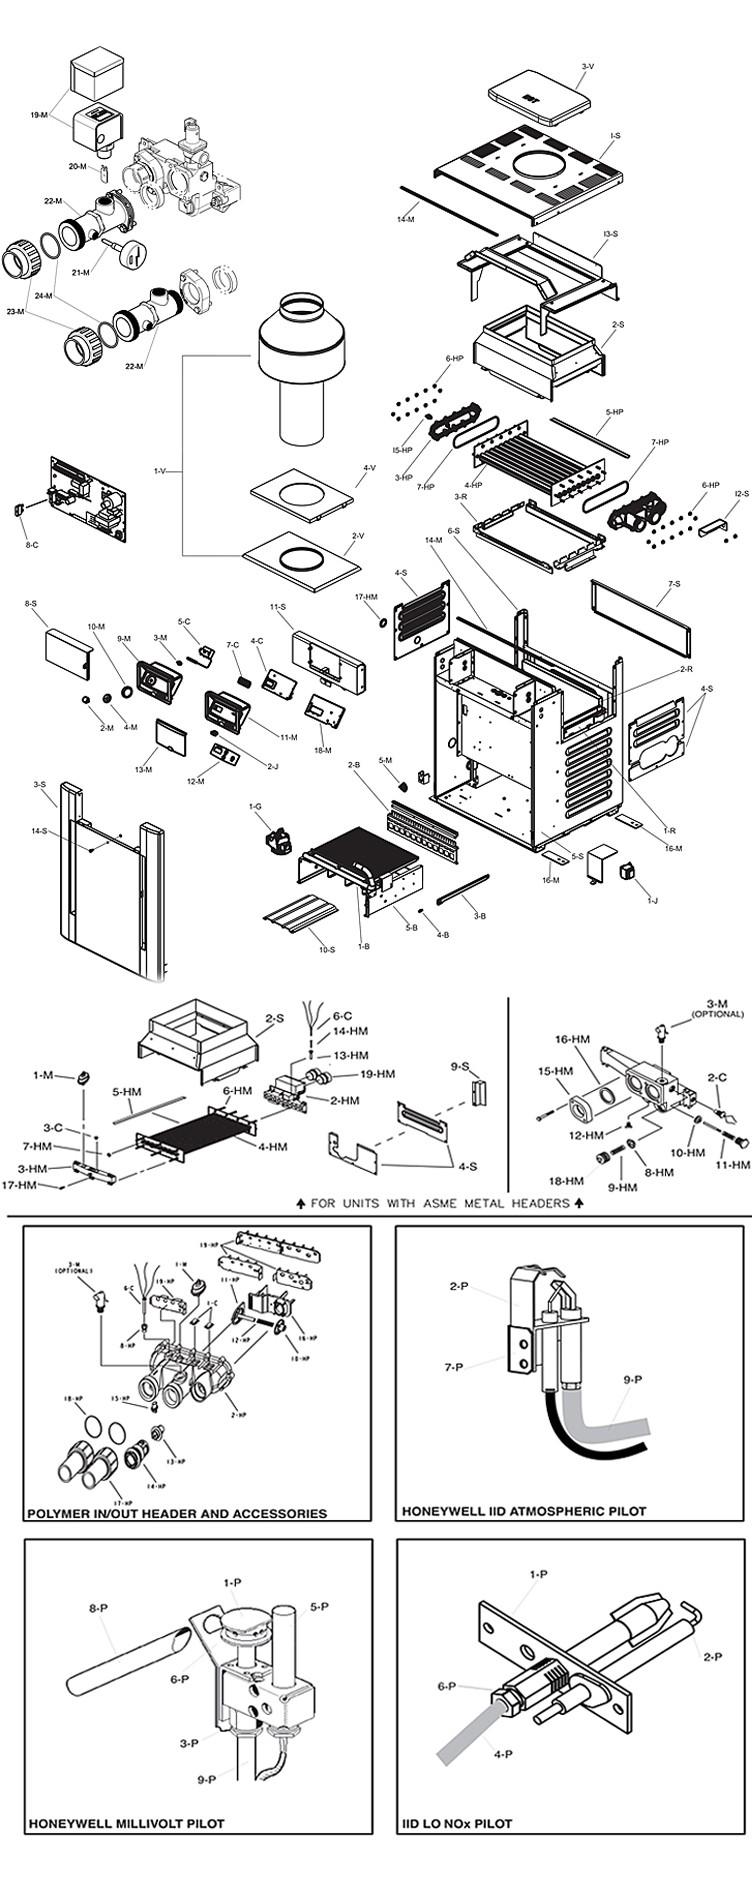 Raypak Digital Natural Gas Pool Heater 180K BTU Electronic Ignition Cupro Nickel Heat Exchanger P-R206A-EN-X #50 014938 P-M206A-EN-X #51 014966 Parts Schematic